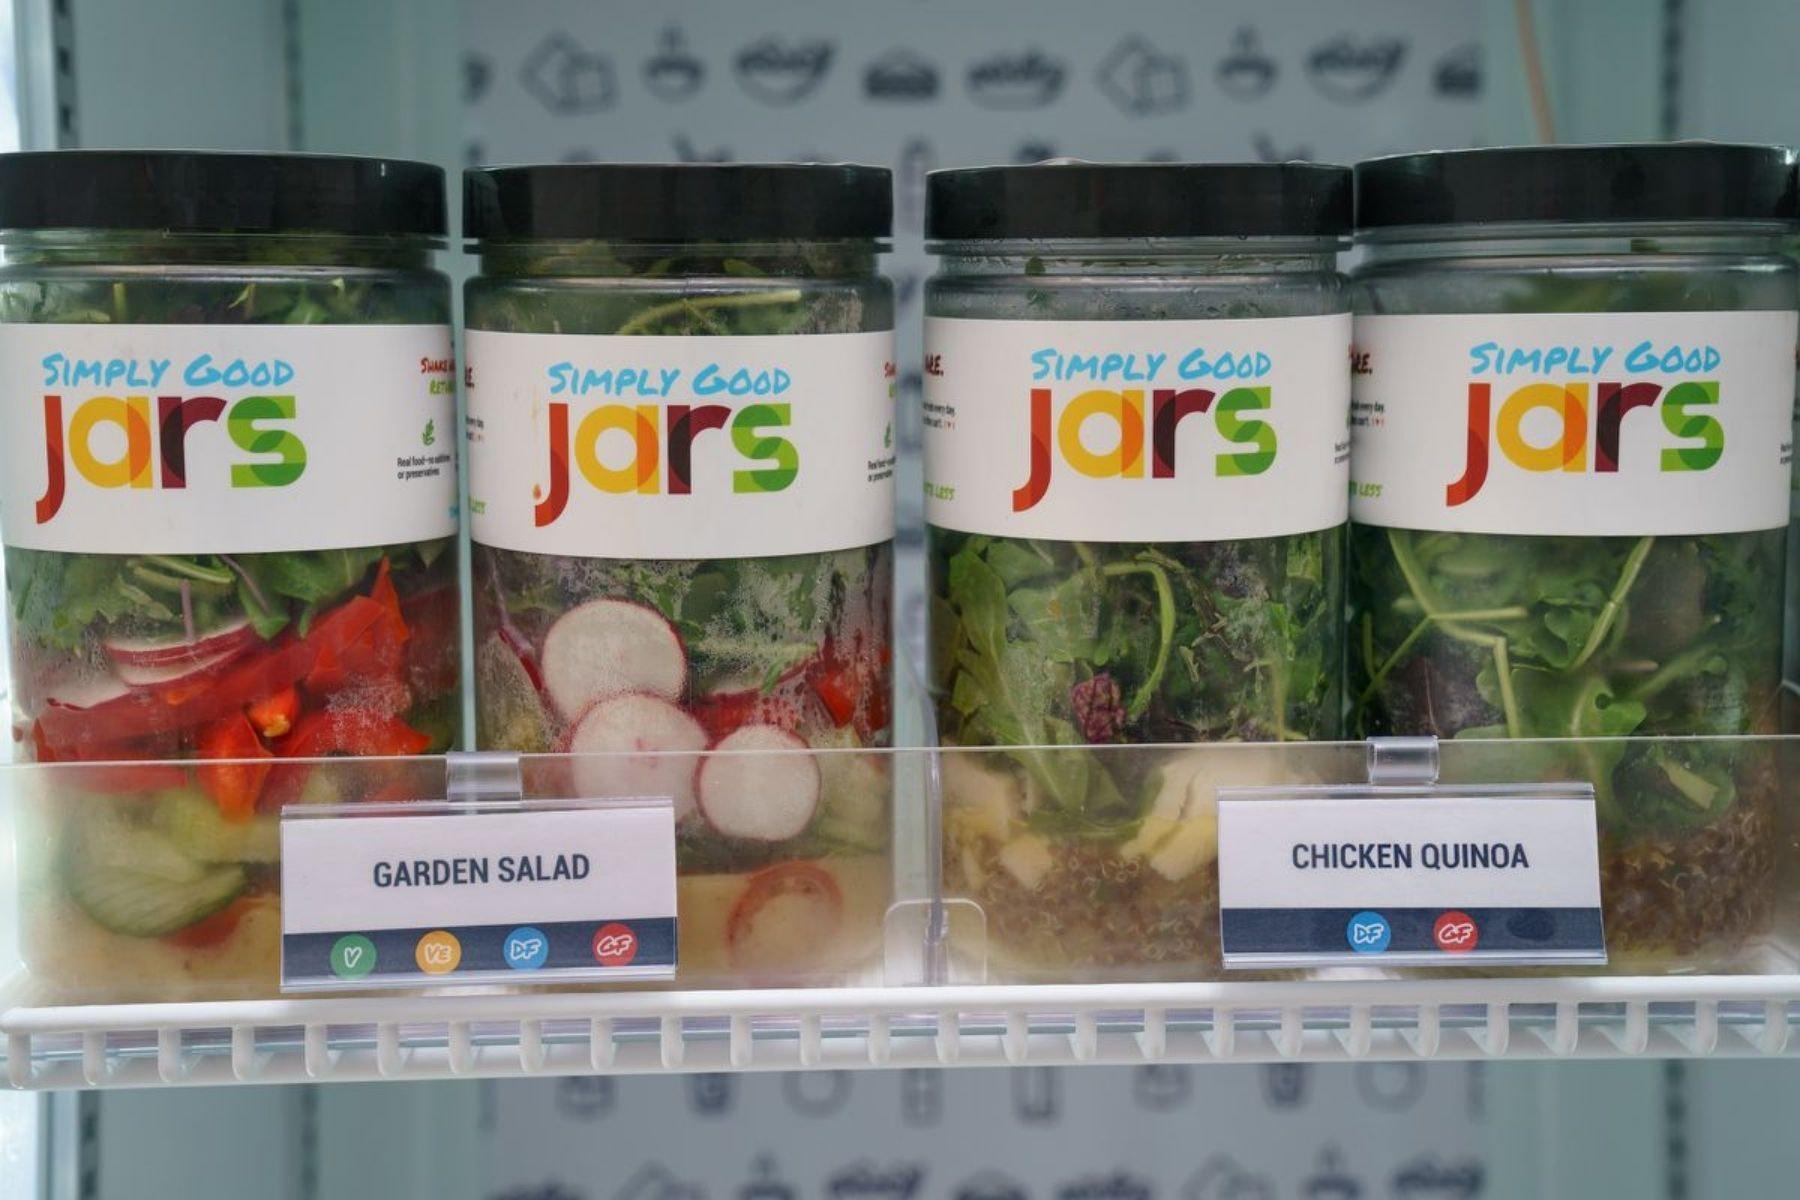 simply good jars byte case study (1)